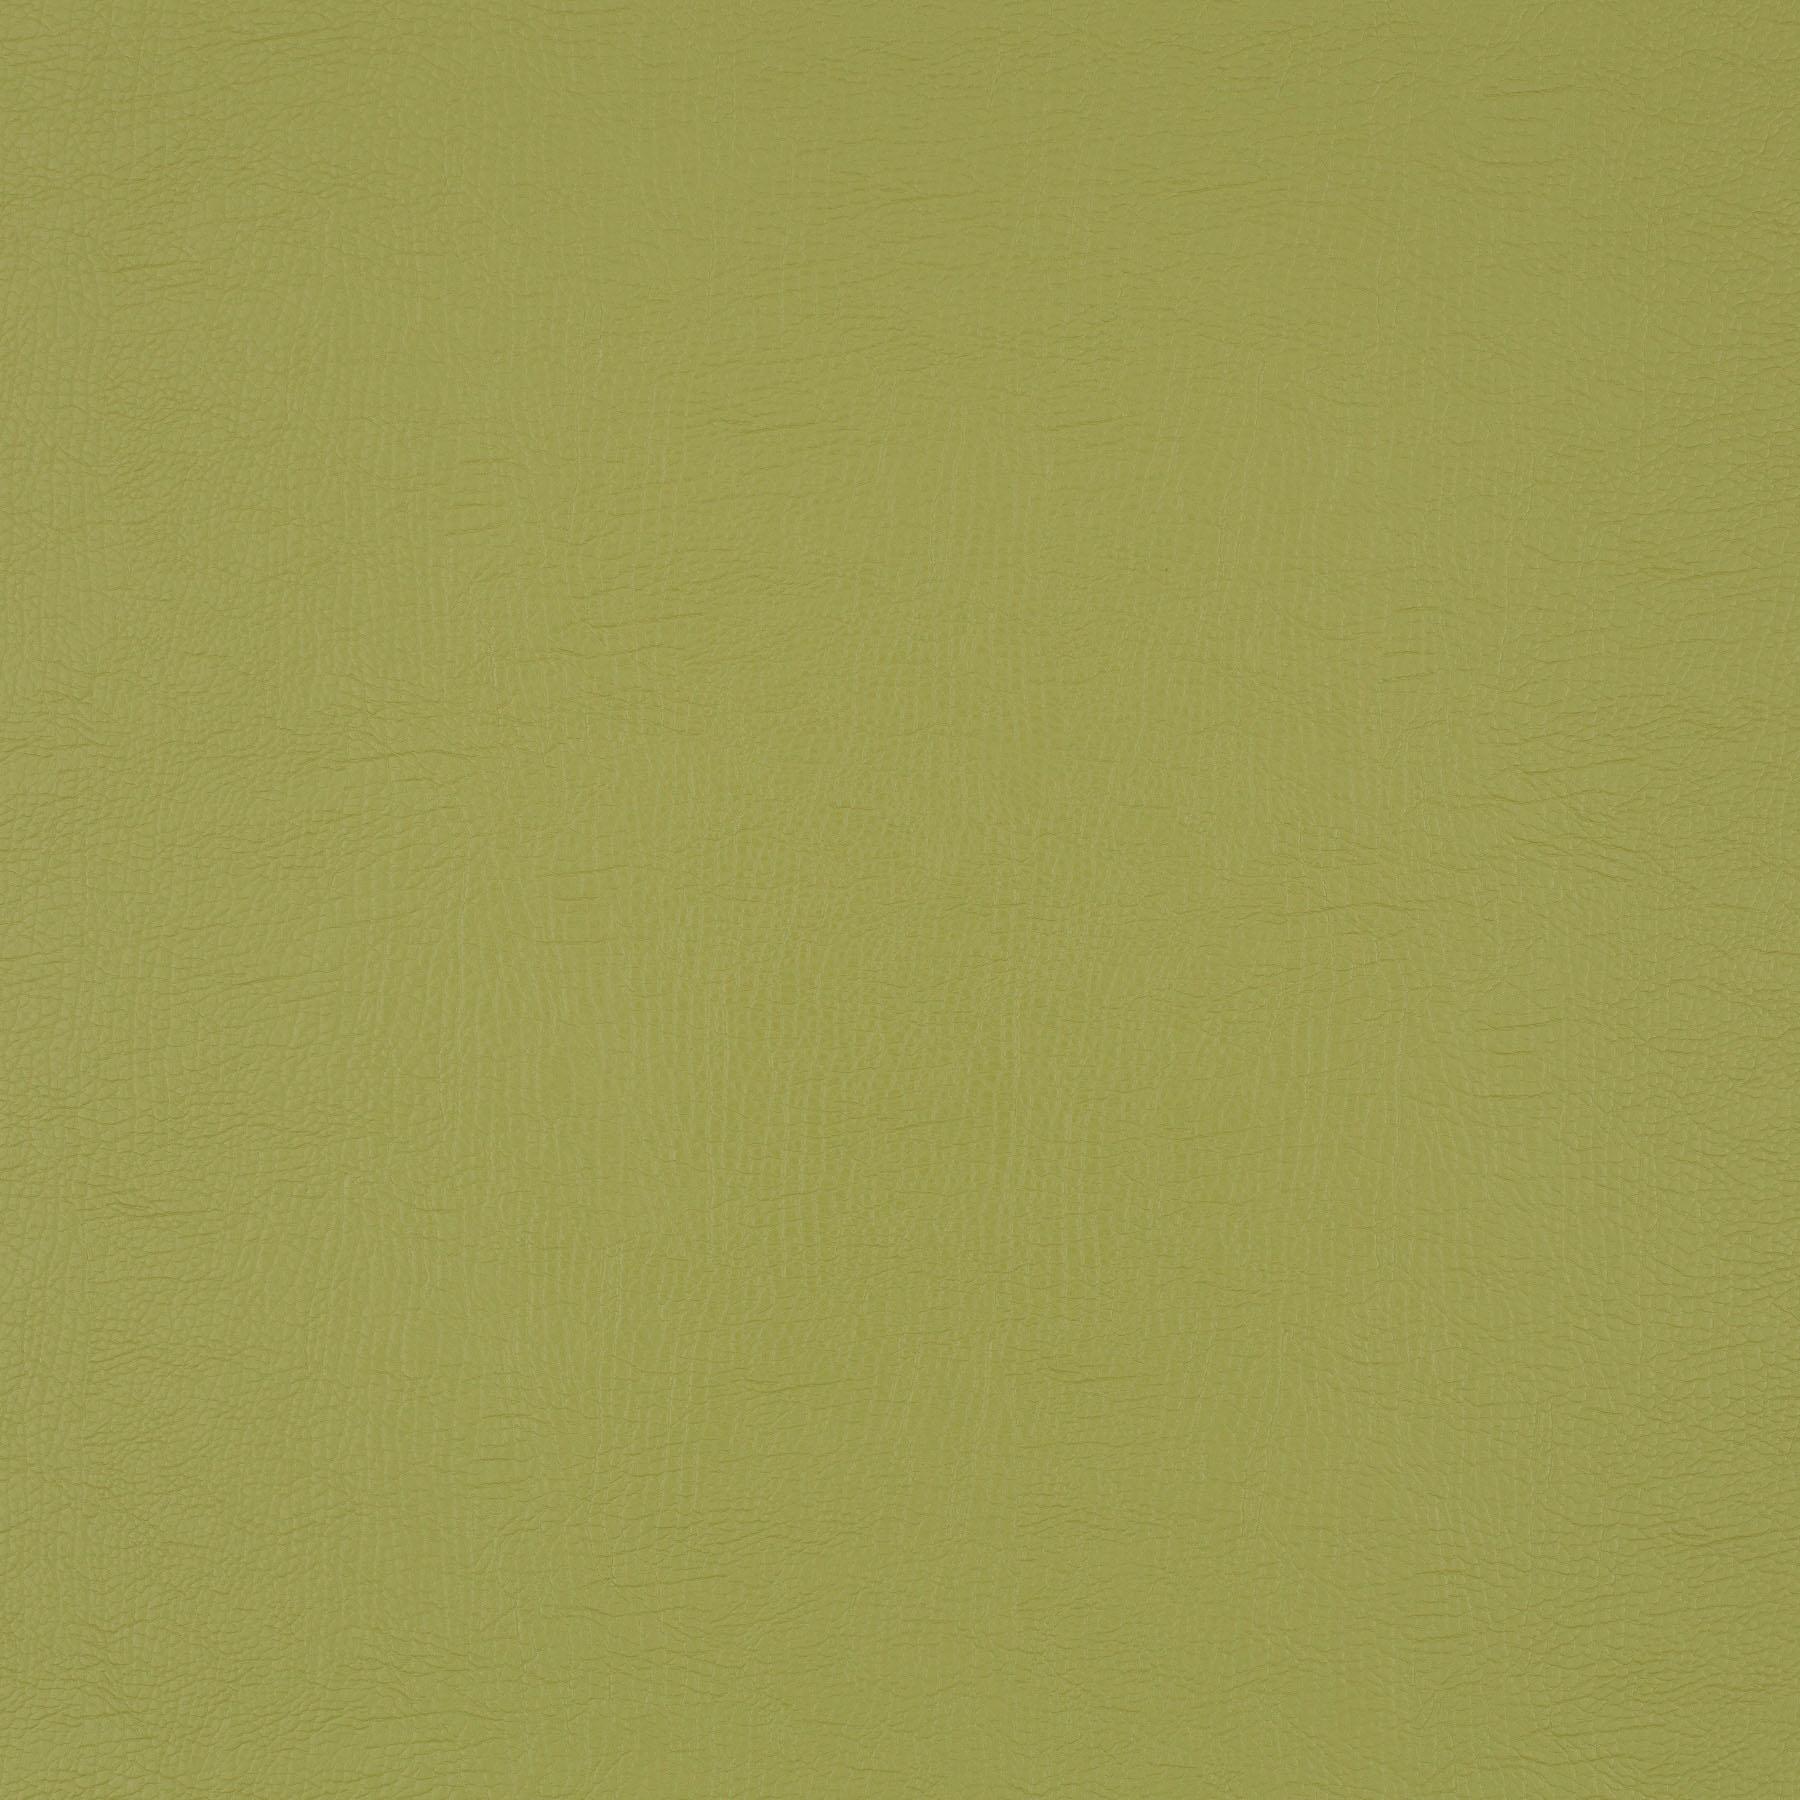 Upholstery Fabric Rocky 1 1280 031 Jab Anstoetz Fabrics